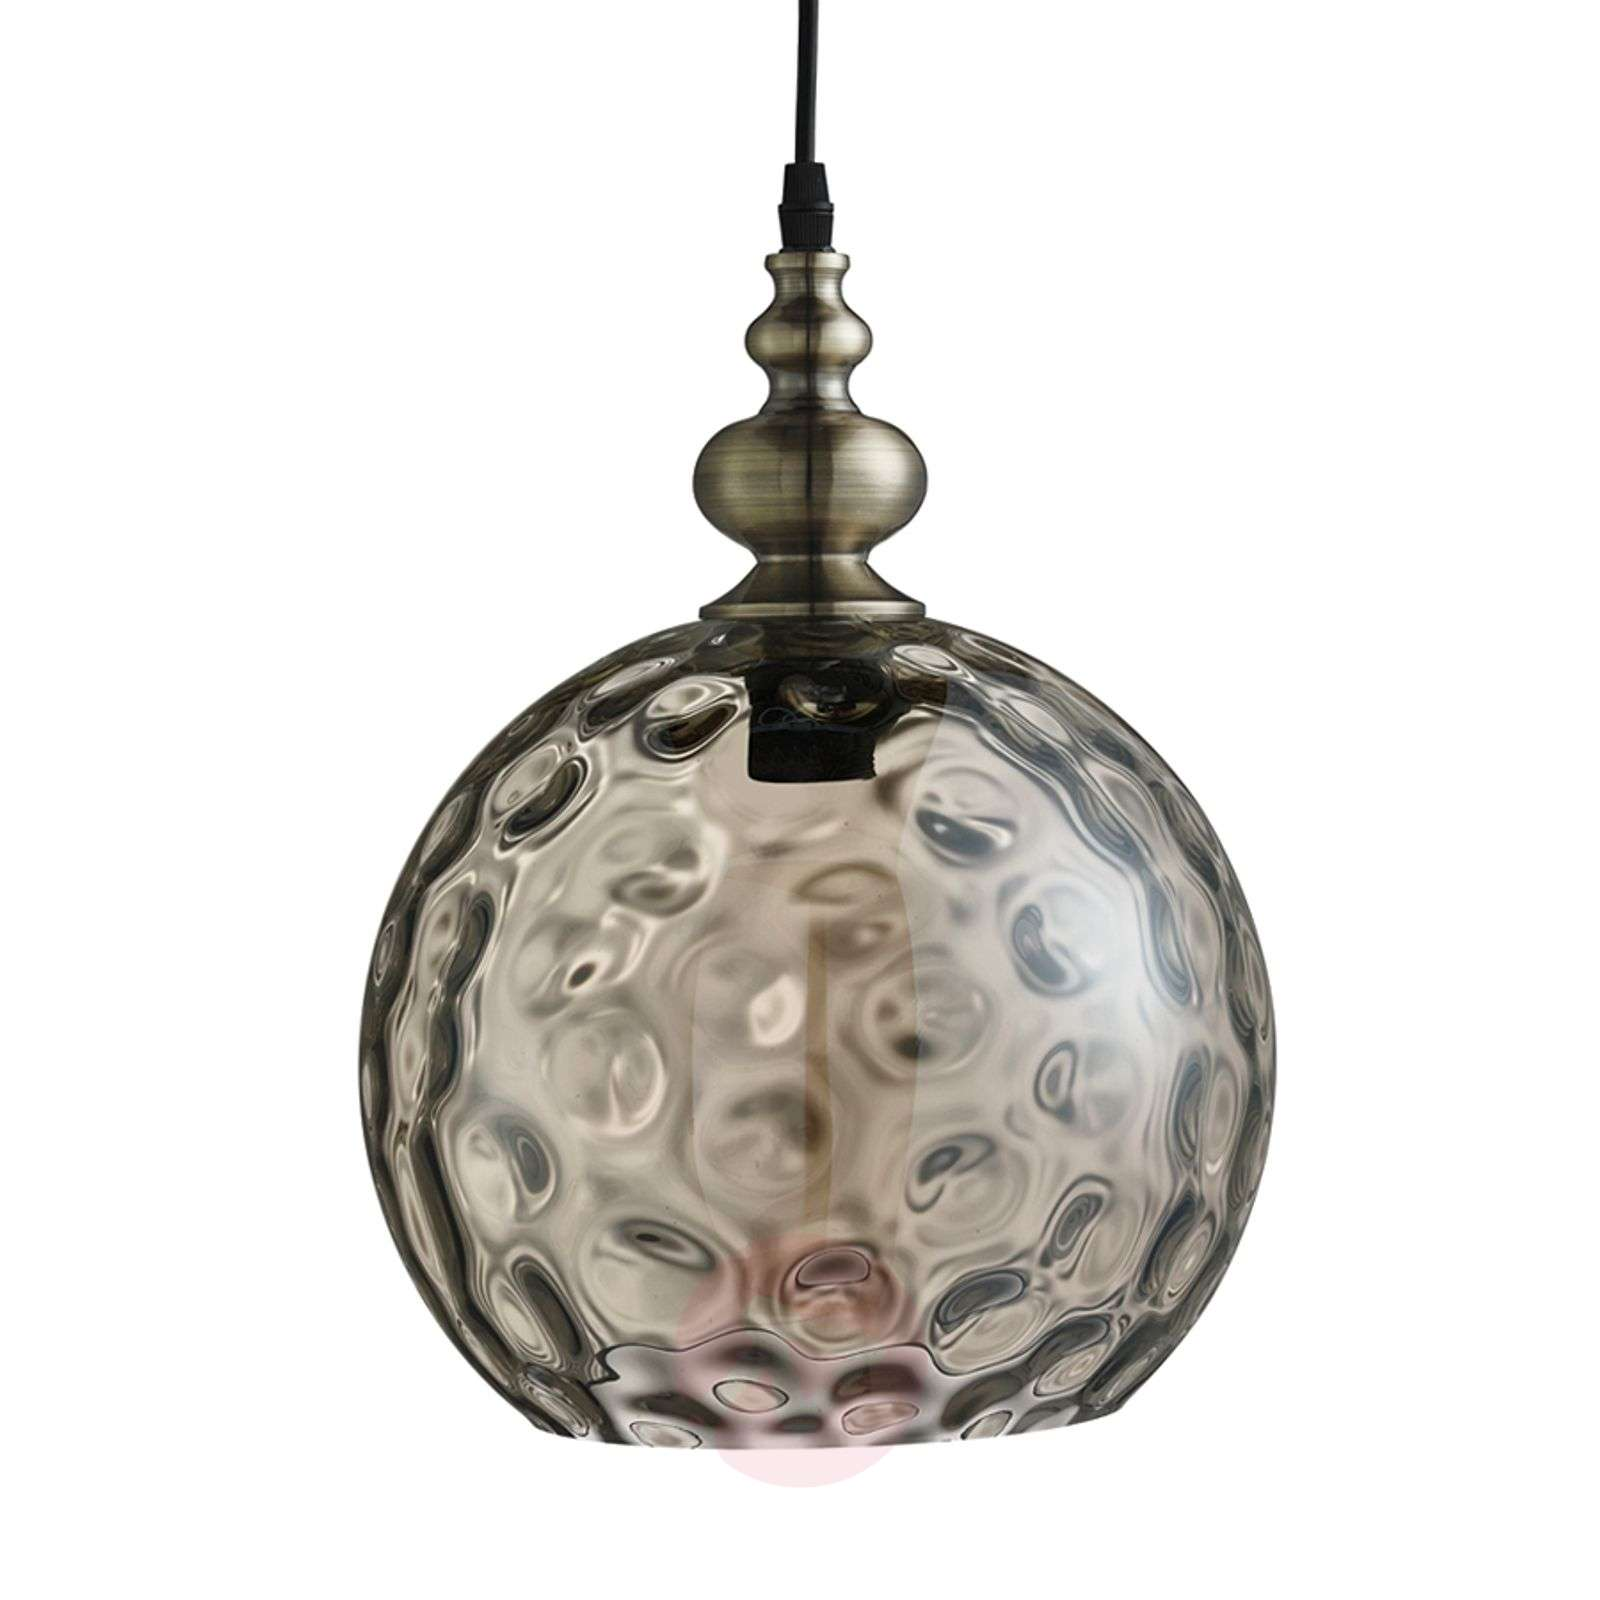 Indiana hanging light of antique design-8570930X-01